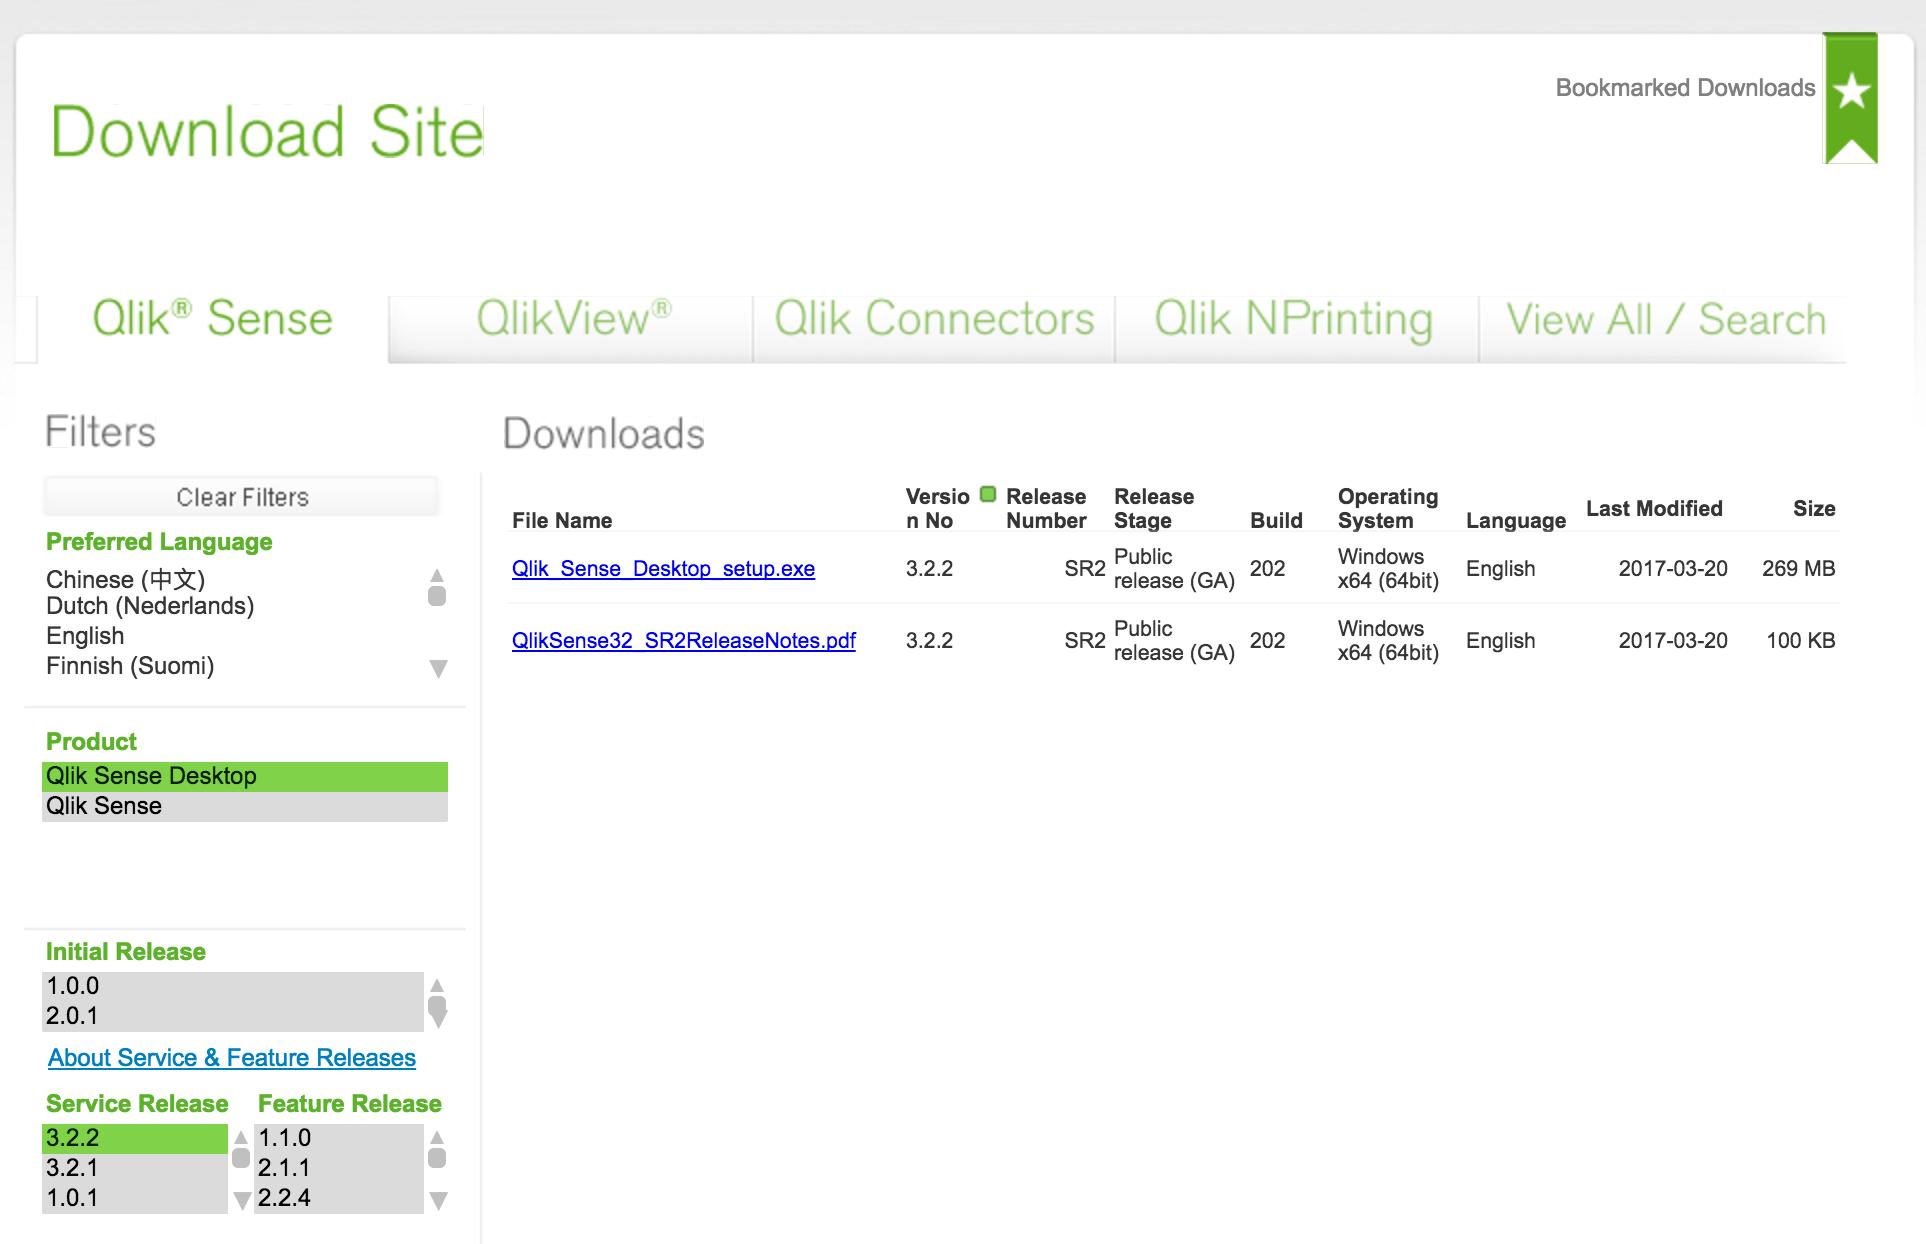 Qlik Sense desktop 3 2 free user Download - Qlik Community